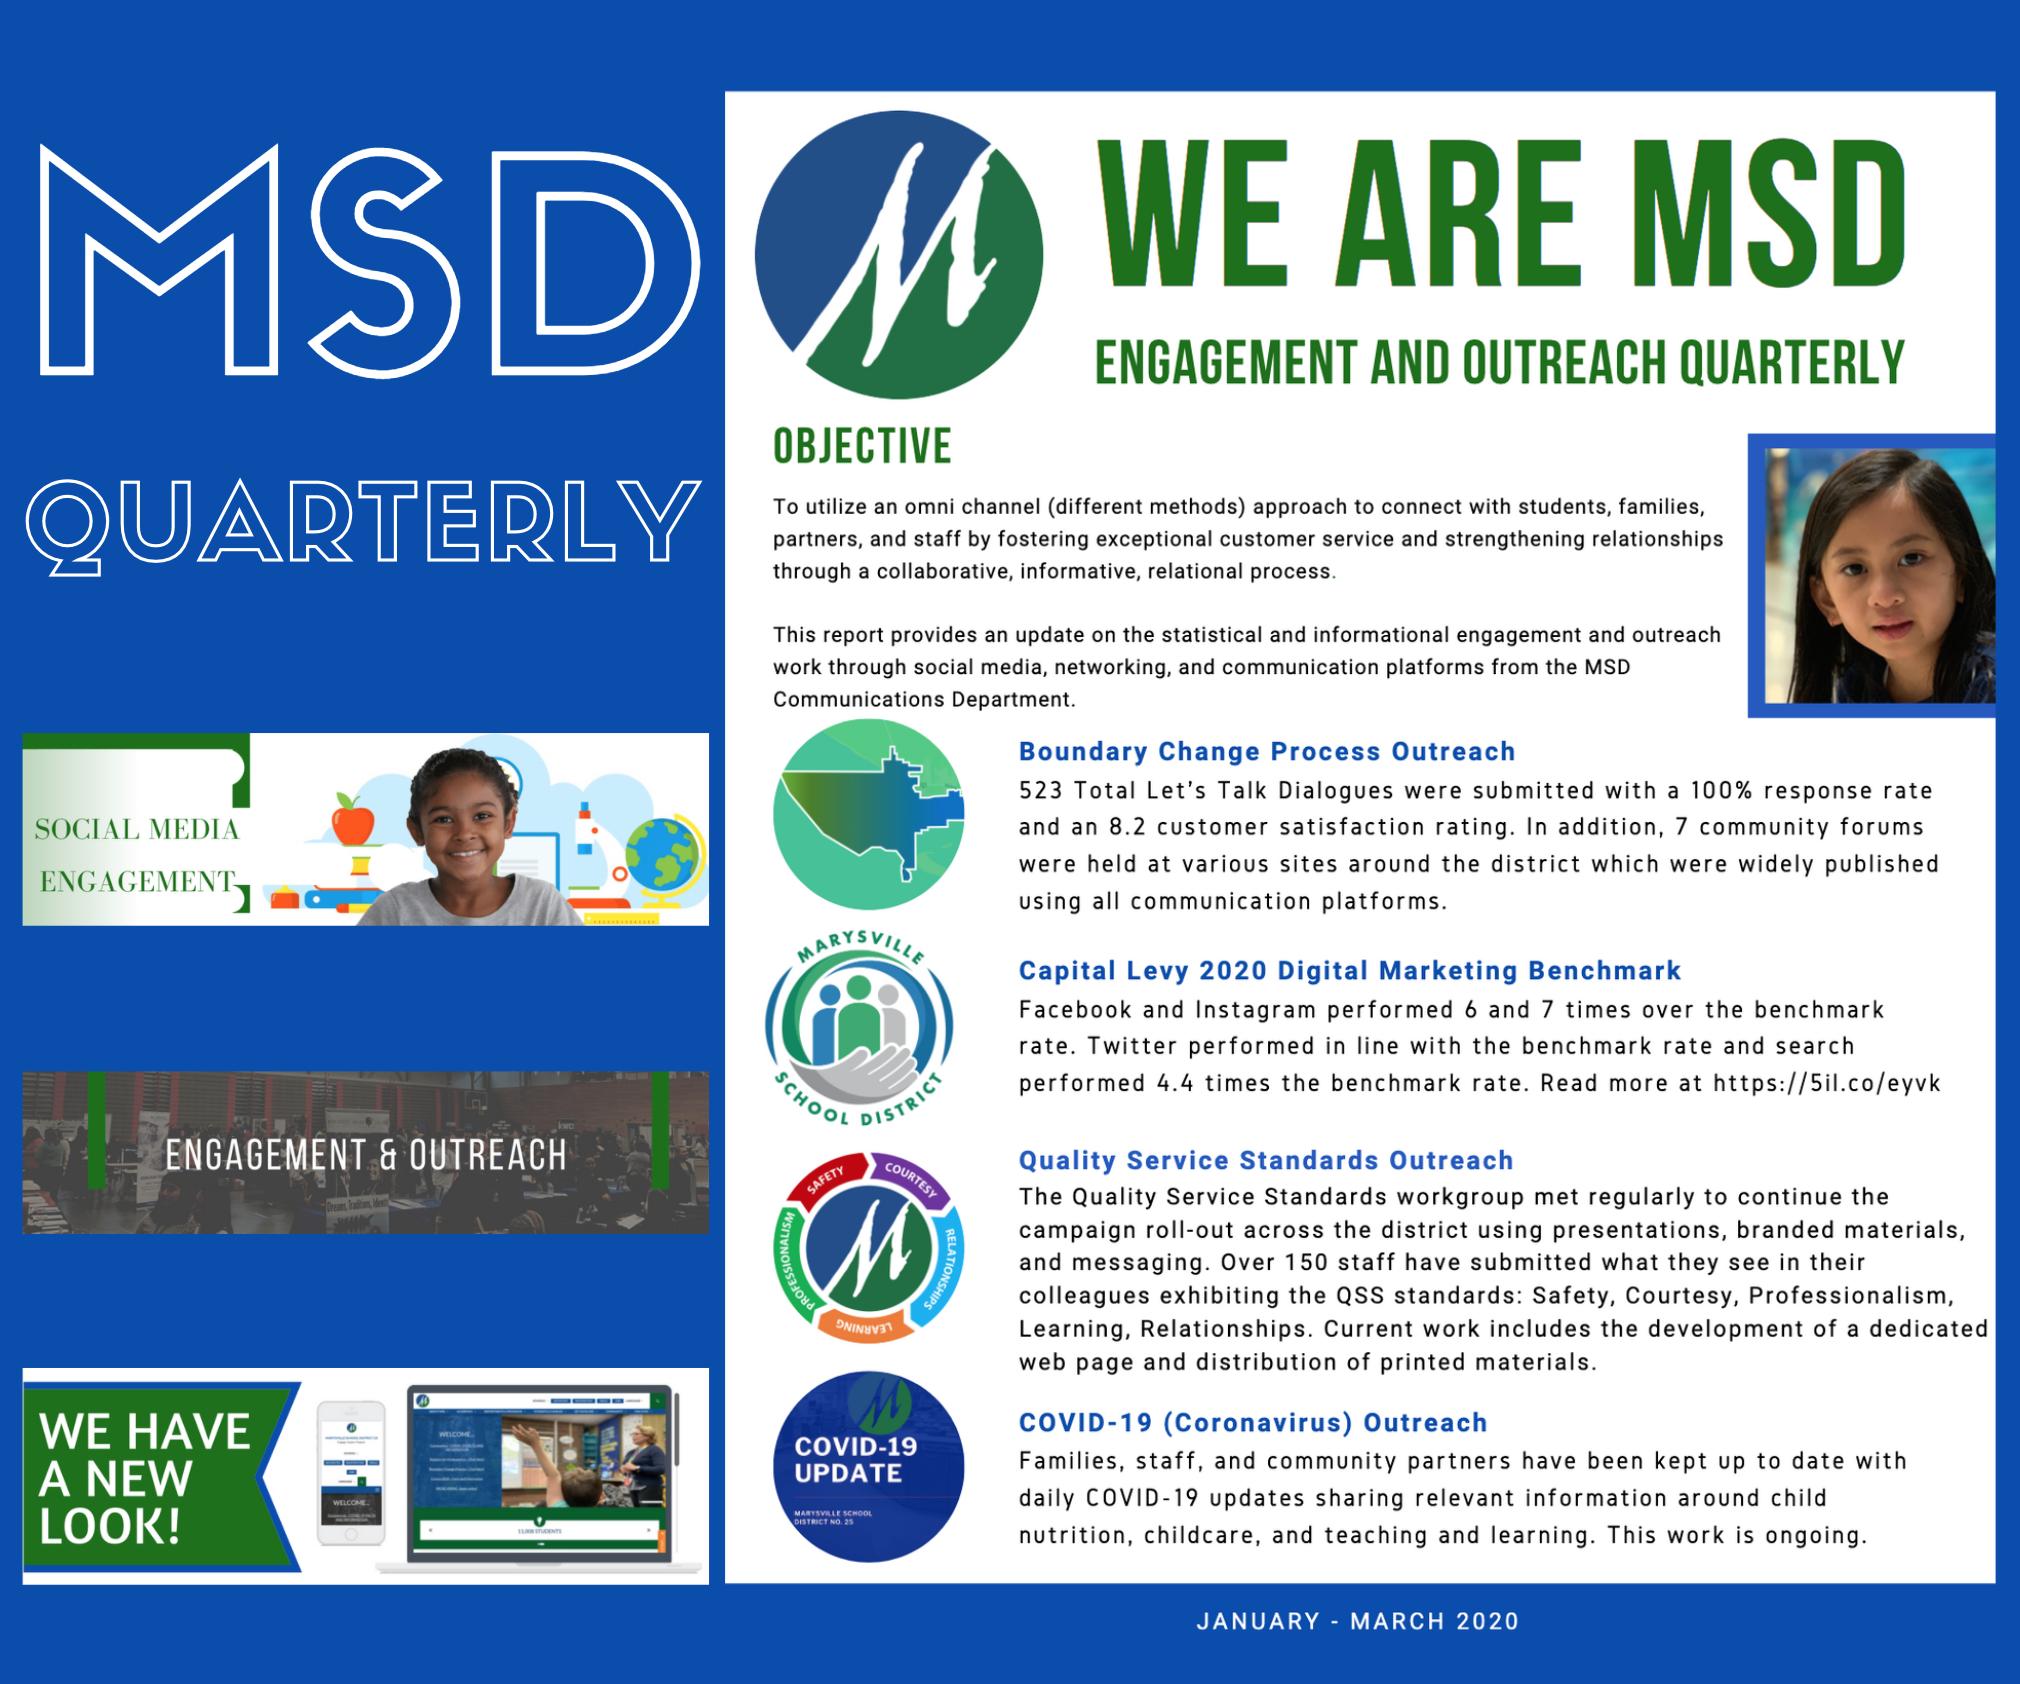 MSD Quarterly